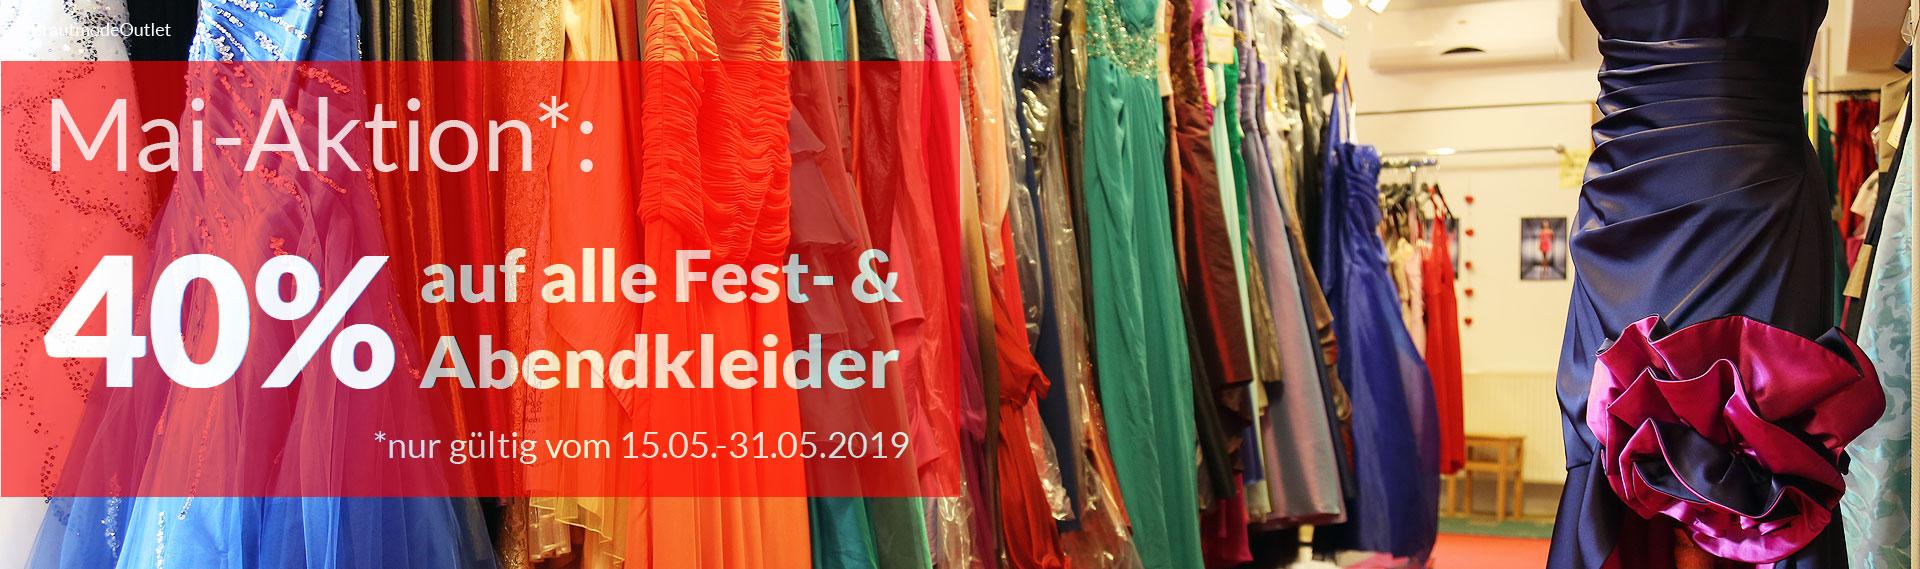 Brautmode Outlet Bautzen Aktion Mai Abendmode Abendkleider